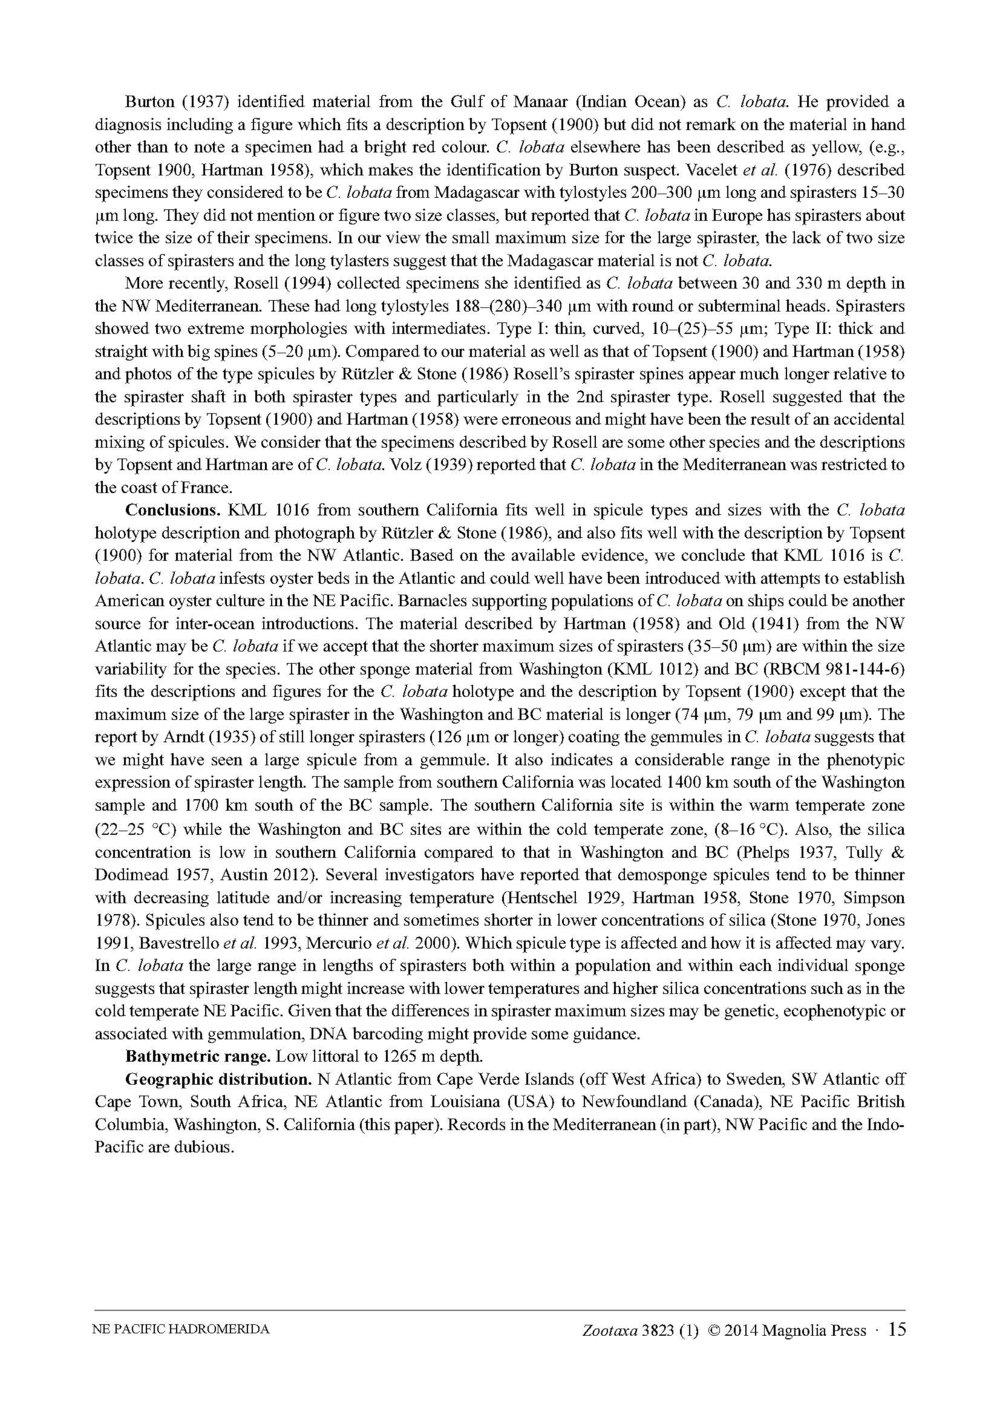 Austin et al 2014 NE Pacific Hadromerids_Page_15.jpg